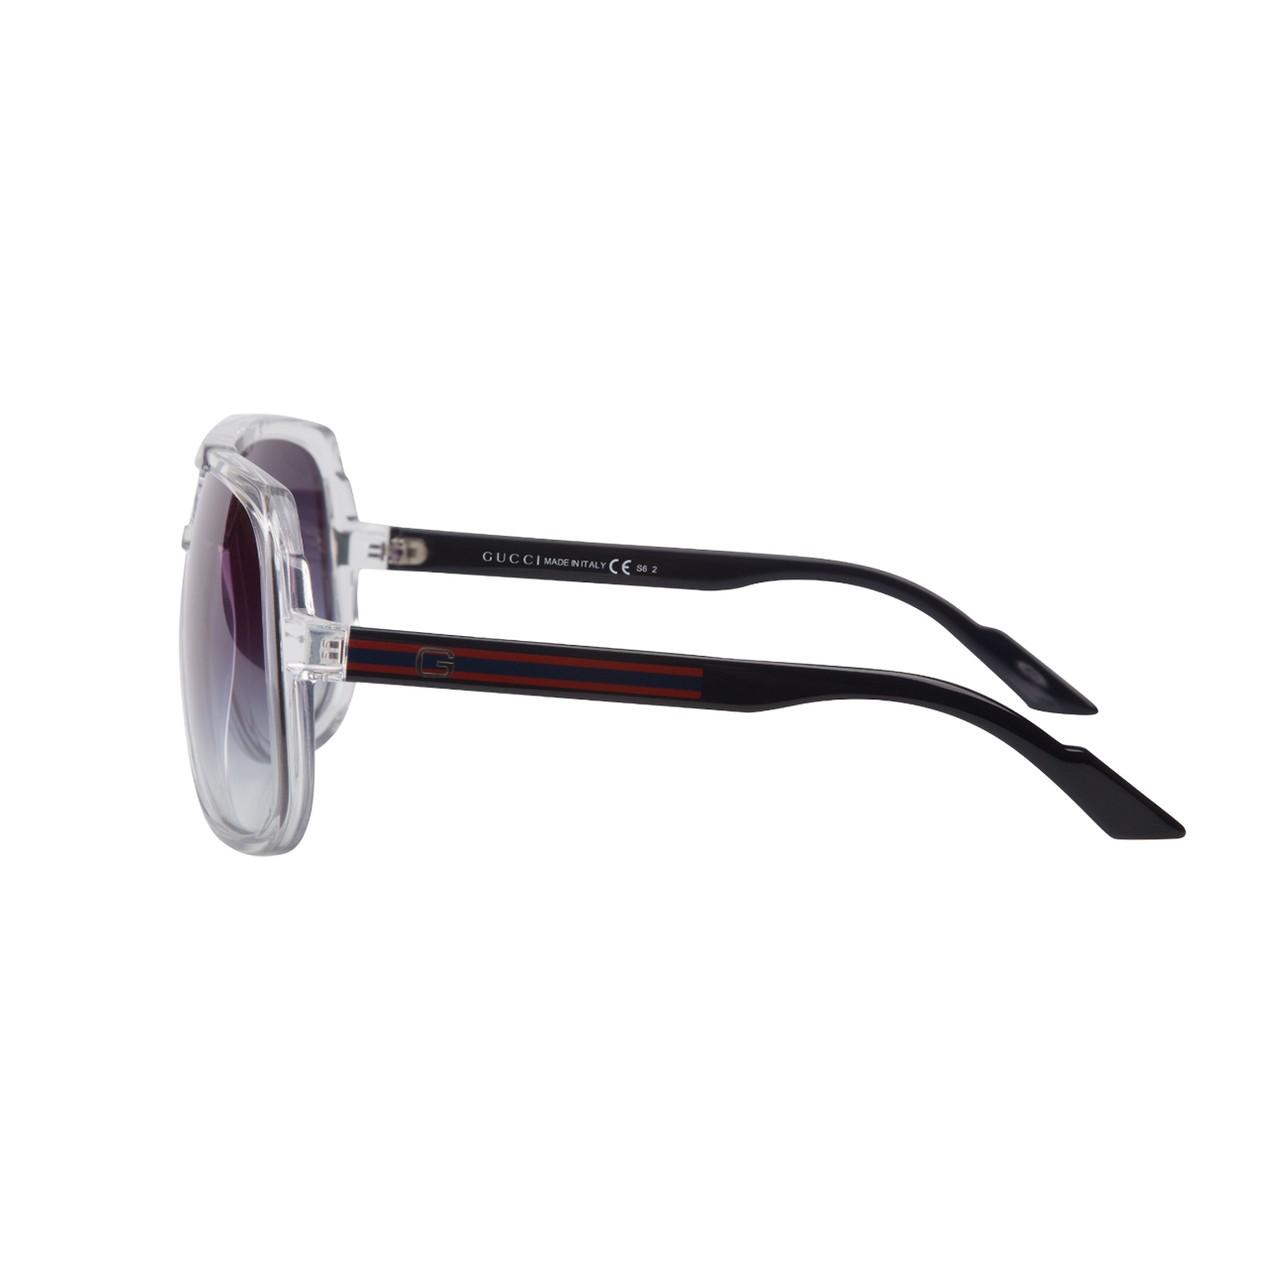 847227733e6 Gucci GG 1622 S U75 08 Sunglasses - Tanga